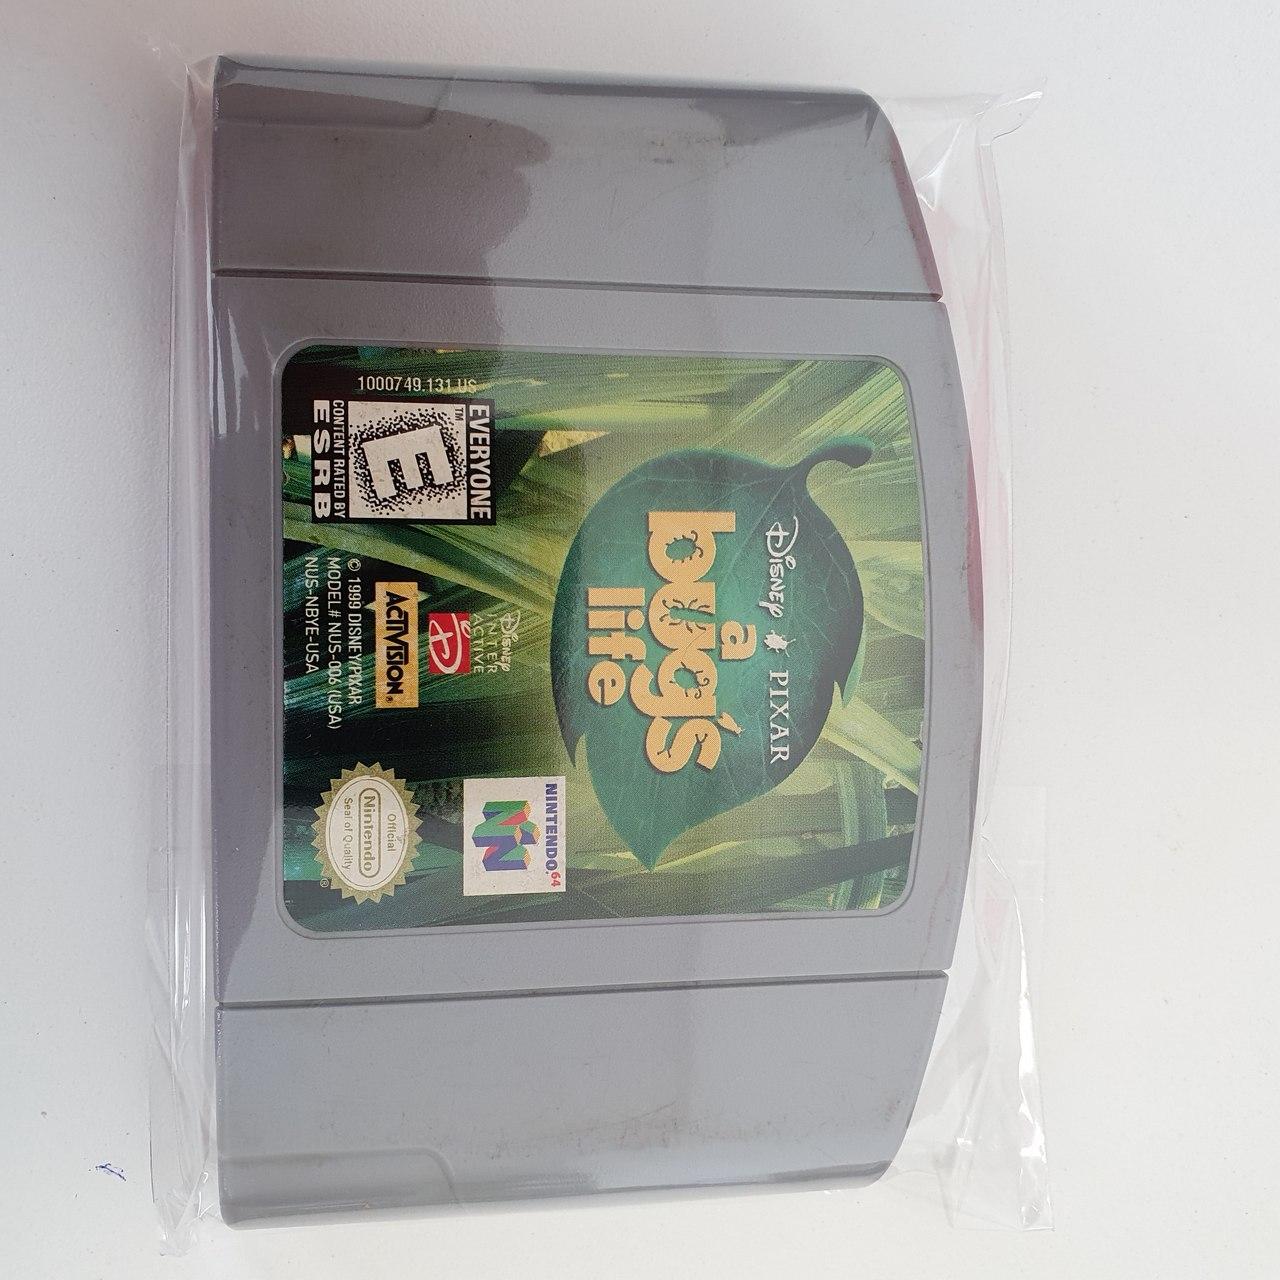 A Bug's Life - Vida de Inseto - Cartucho - Nintendo 64 - Usado